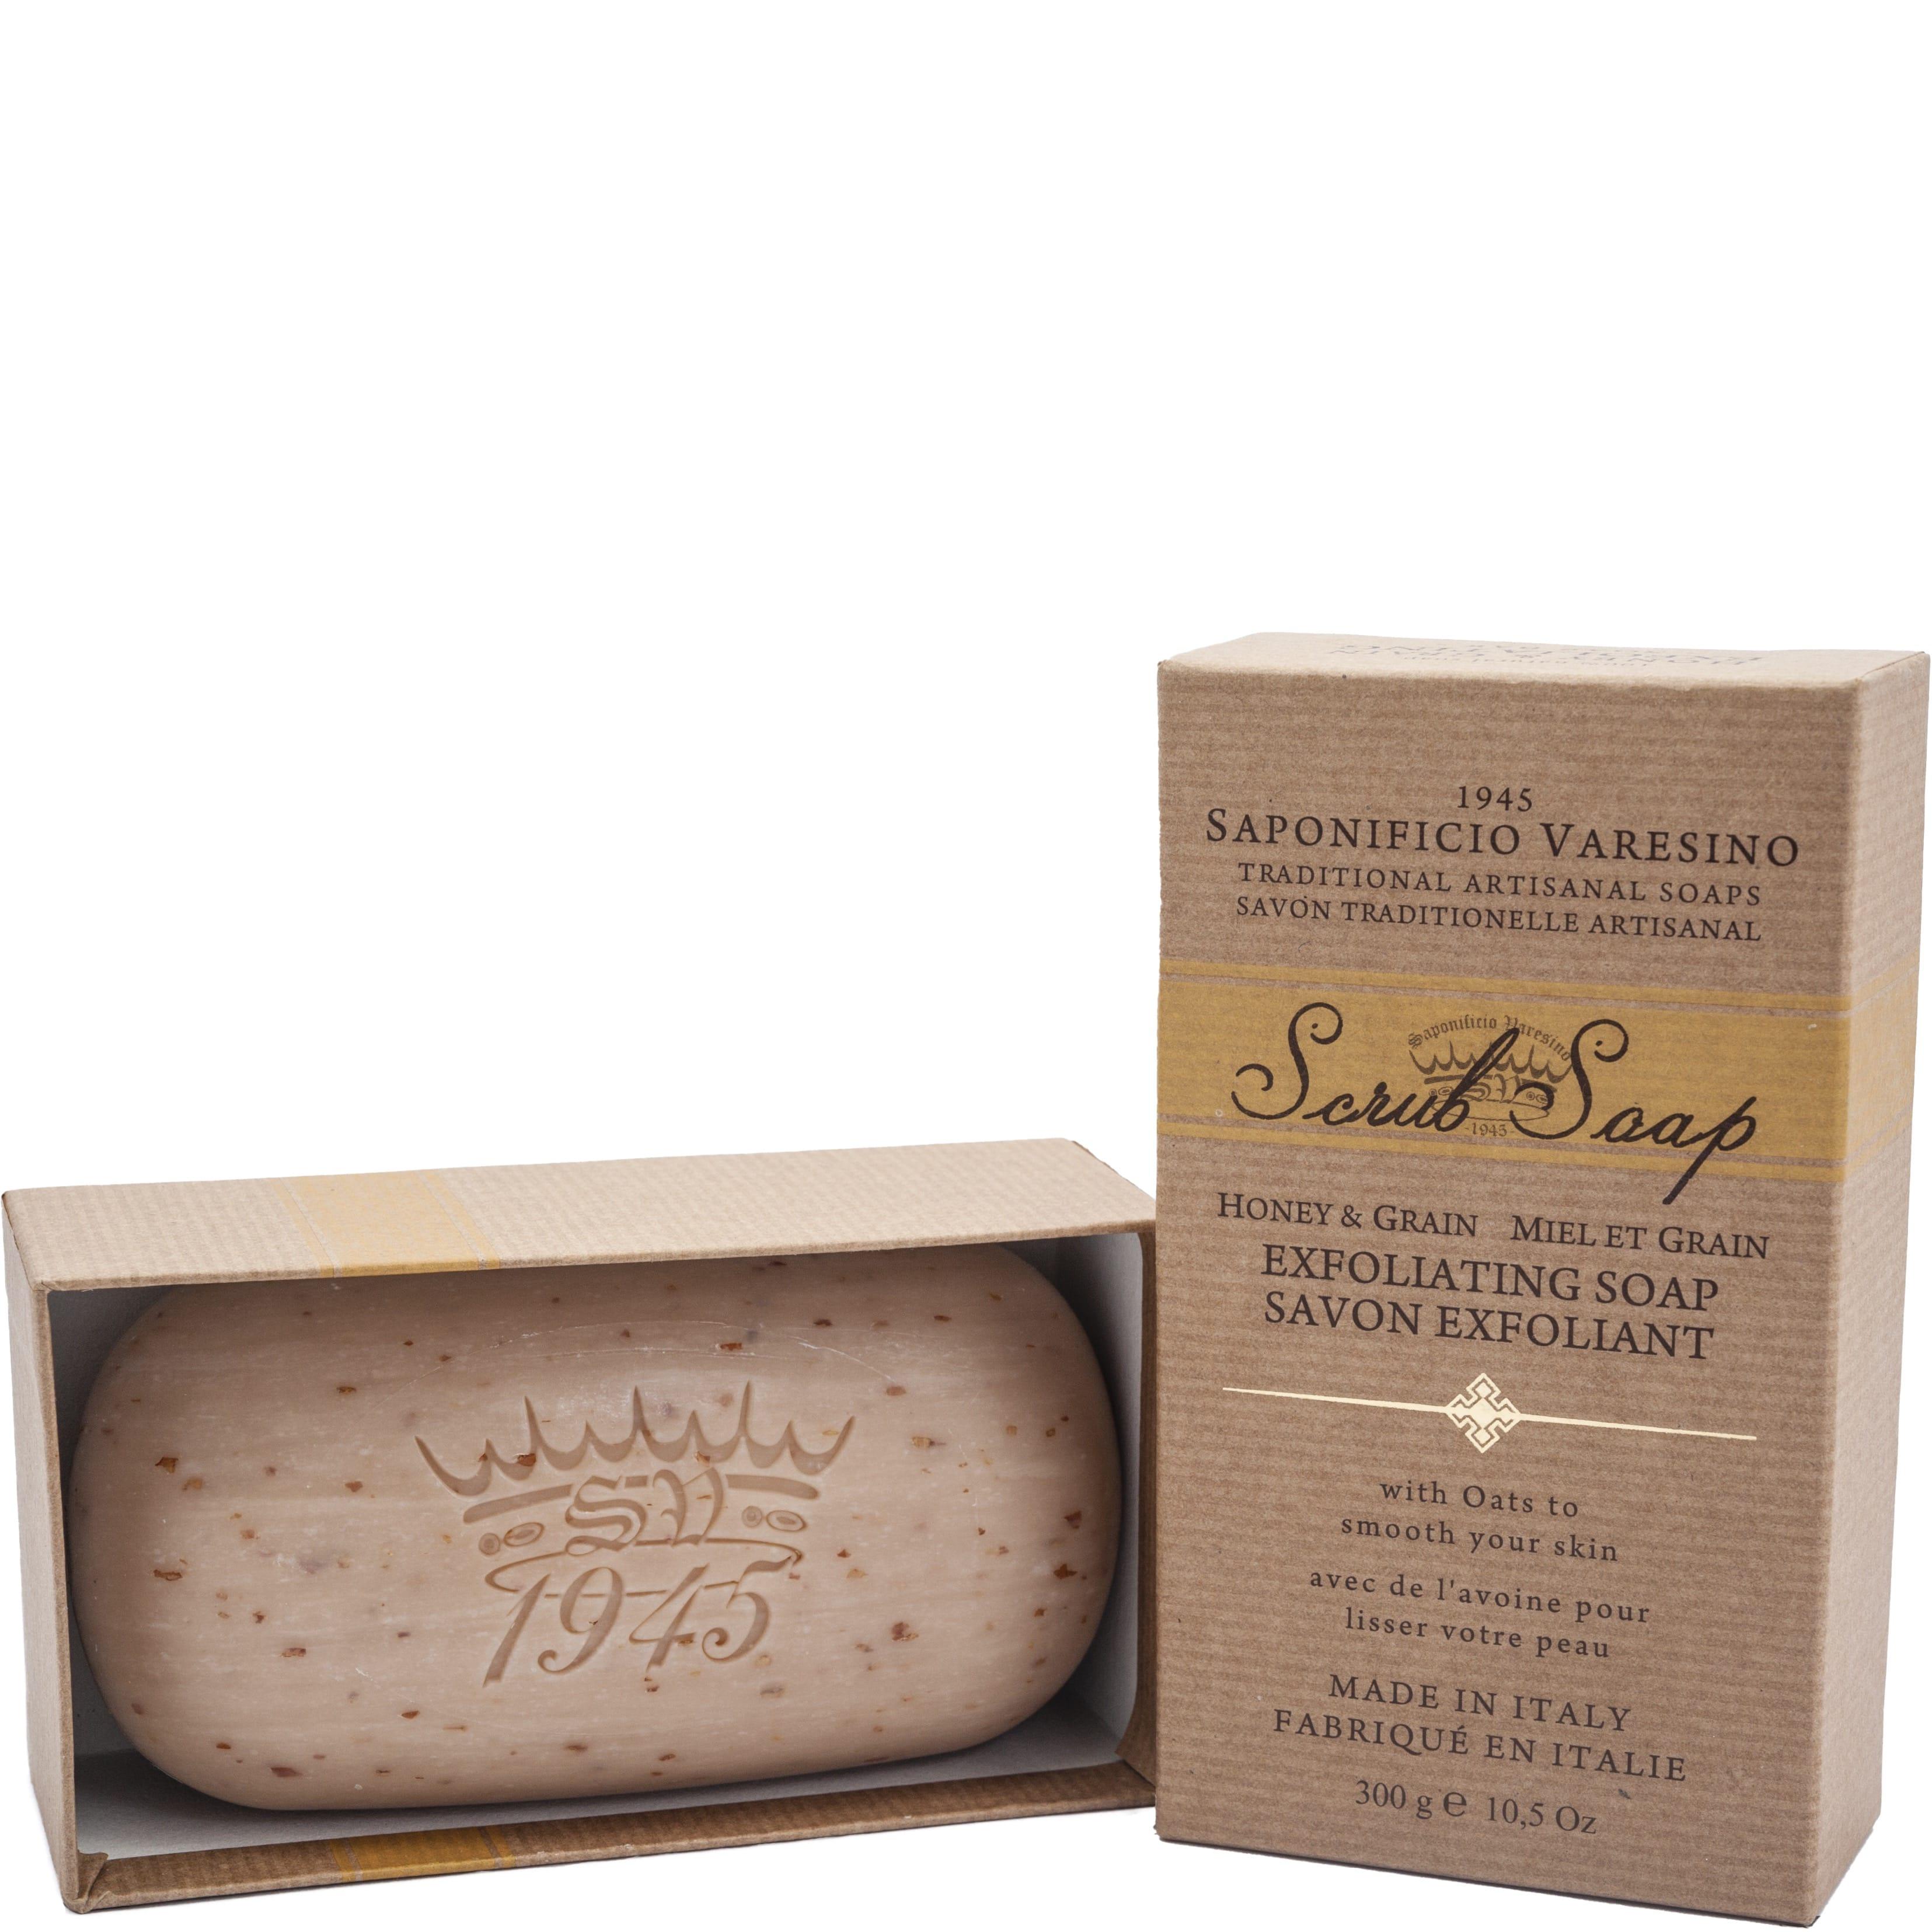 Hand- & Body Scrub Soap Honey & Grain